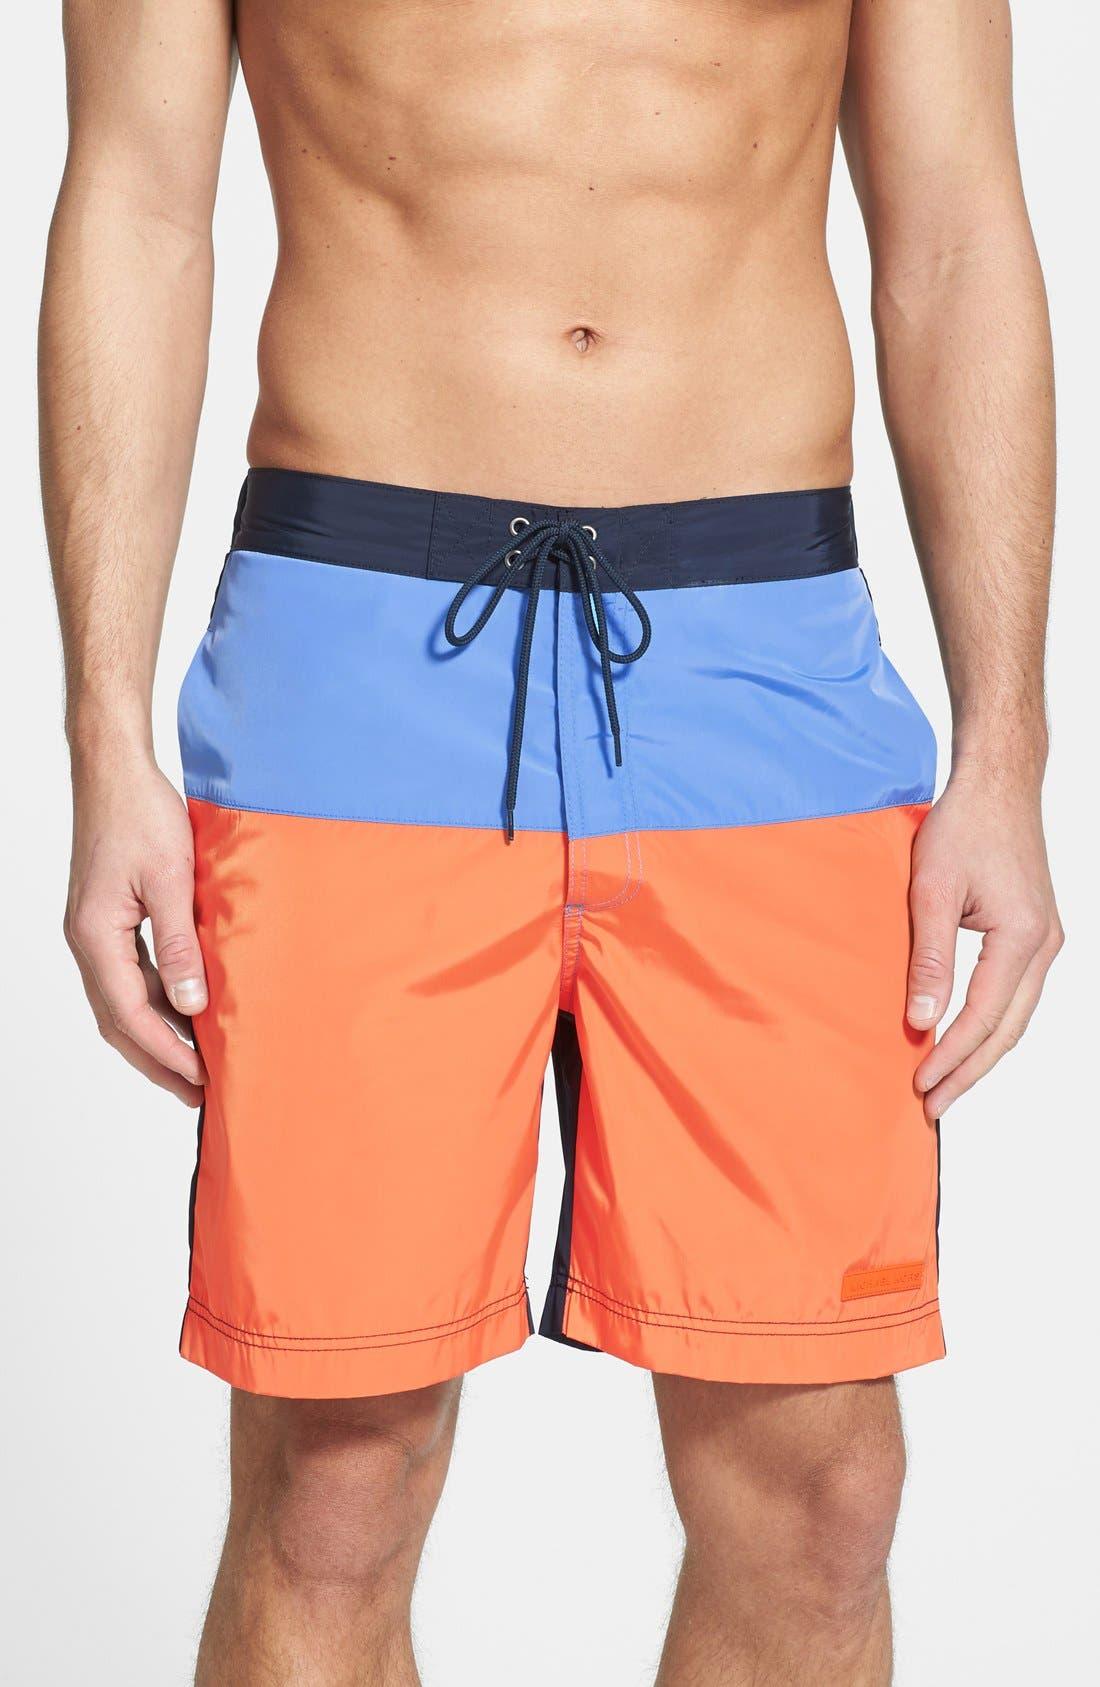 Alternate Image 1 Selected - Michael Kors Colorblock Board Shorts